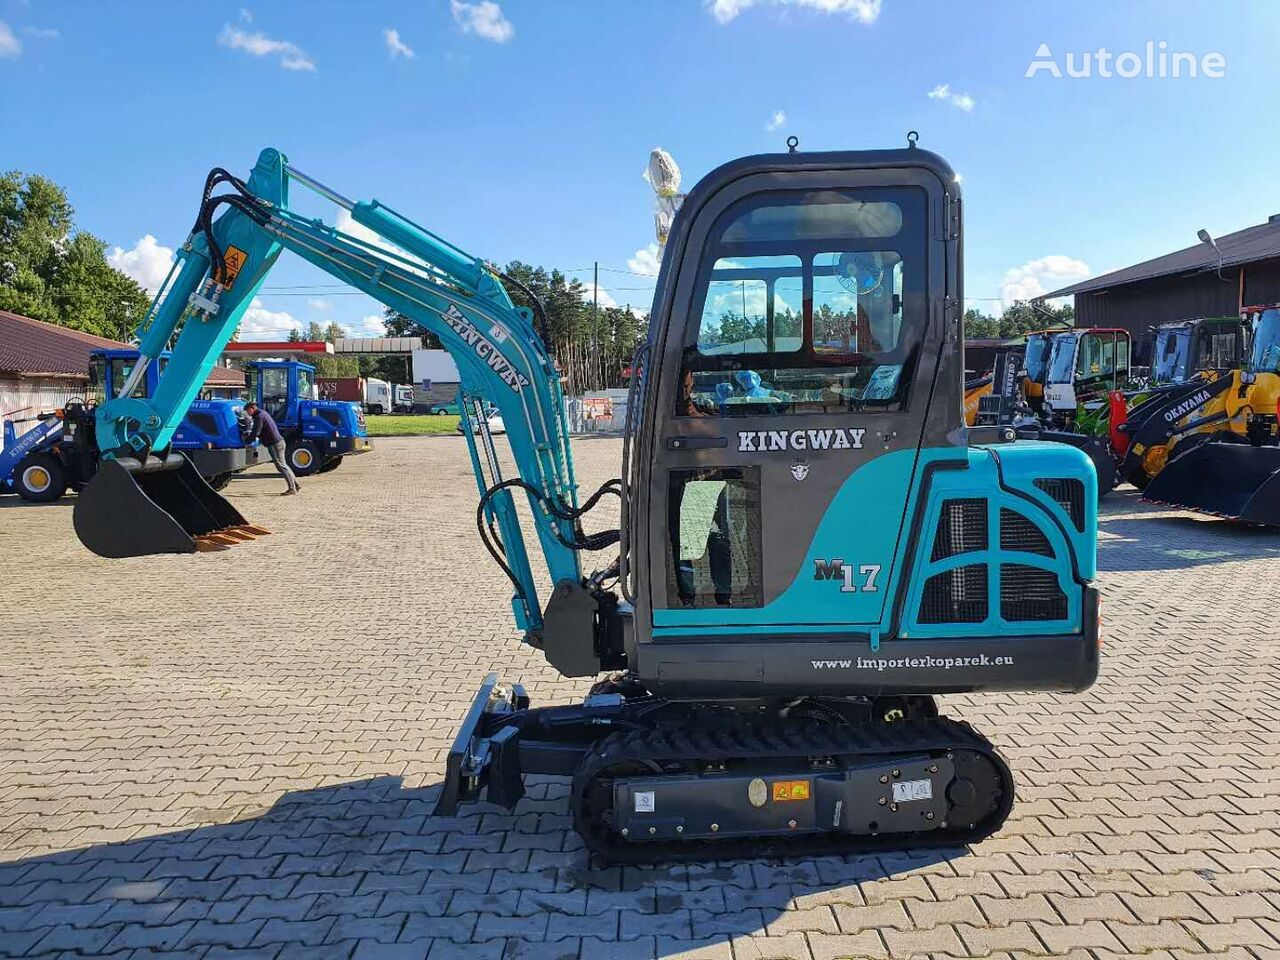 new KINGWAY M17 + łyżki 300/500/800 mini excavator